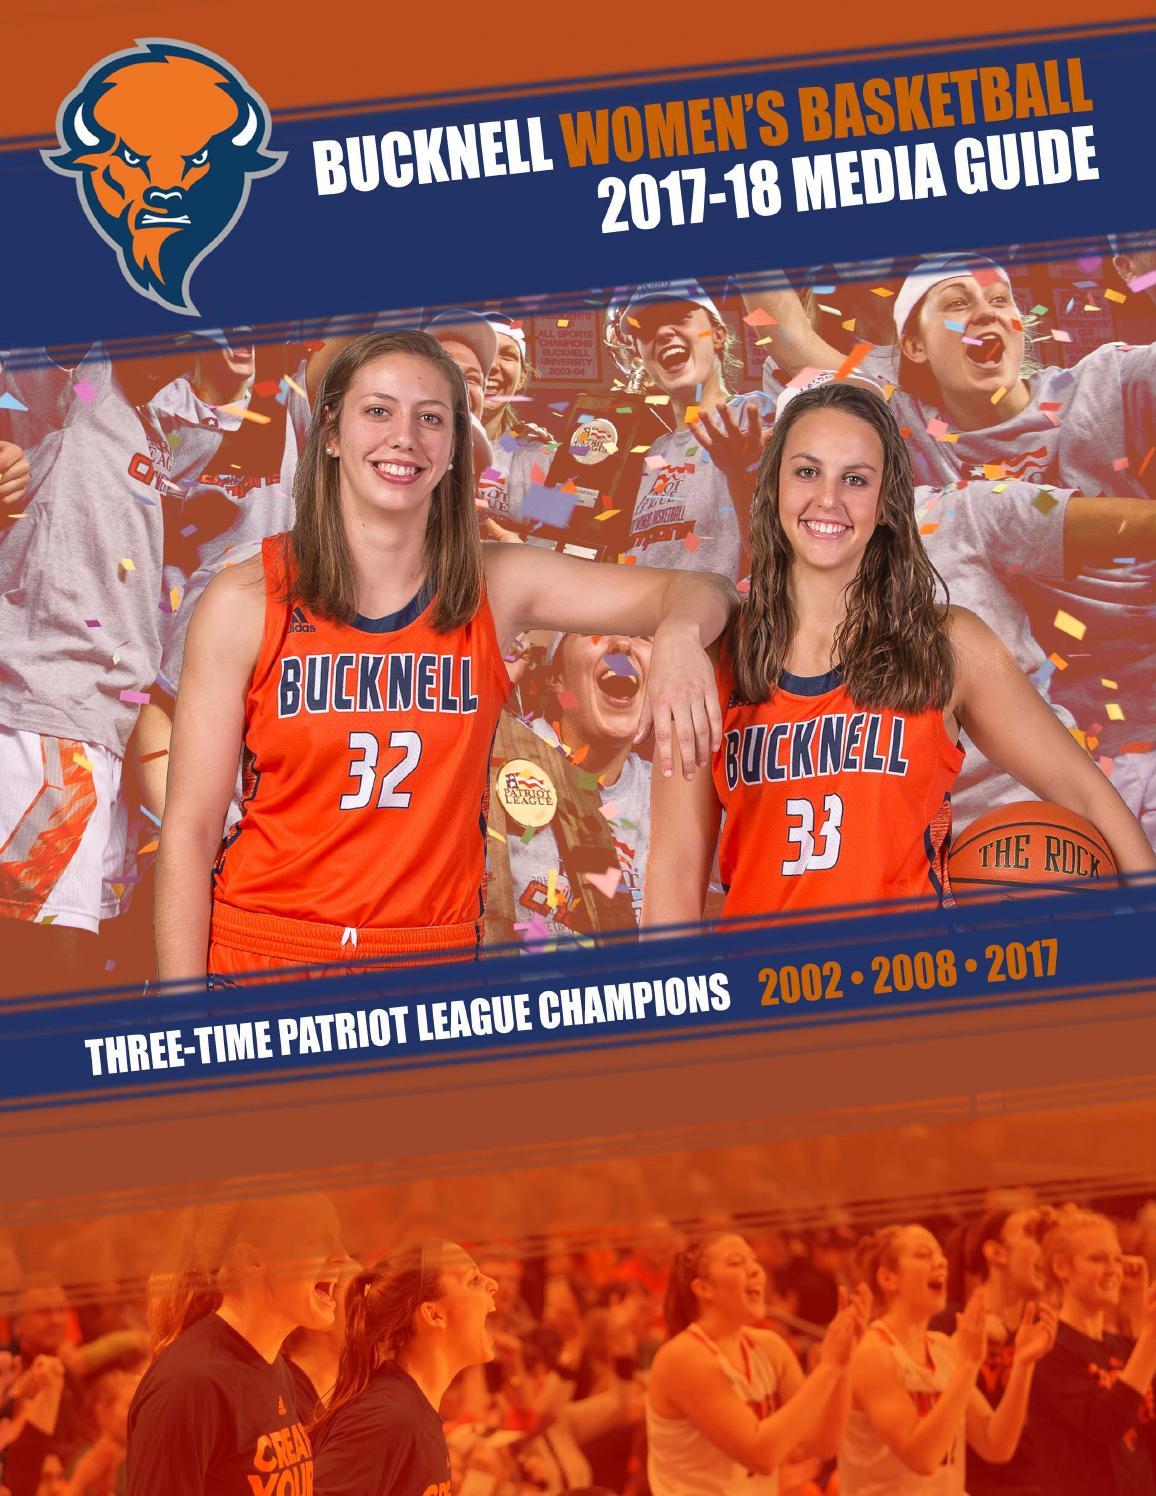 bdd2b29d2a14 2017-18 Bucknell Women s Basketball Media Guide by Bucknell University -  issuu